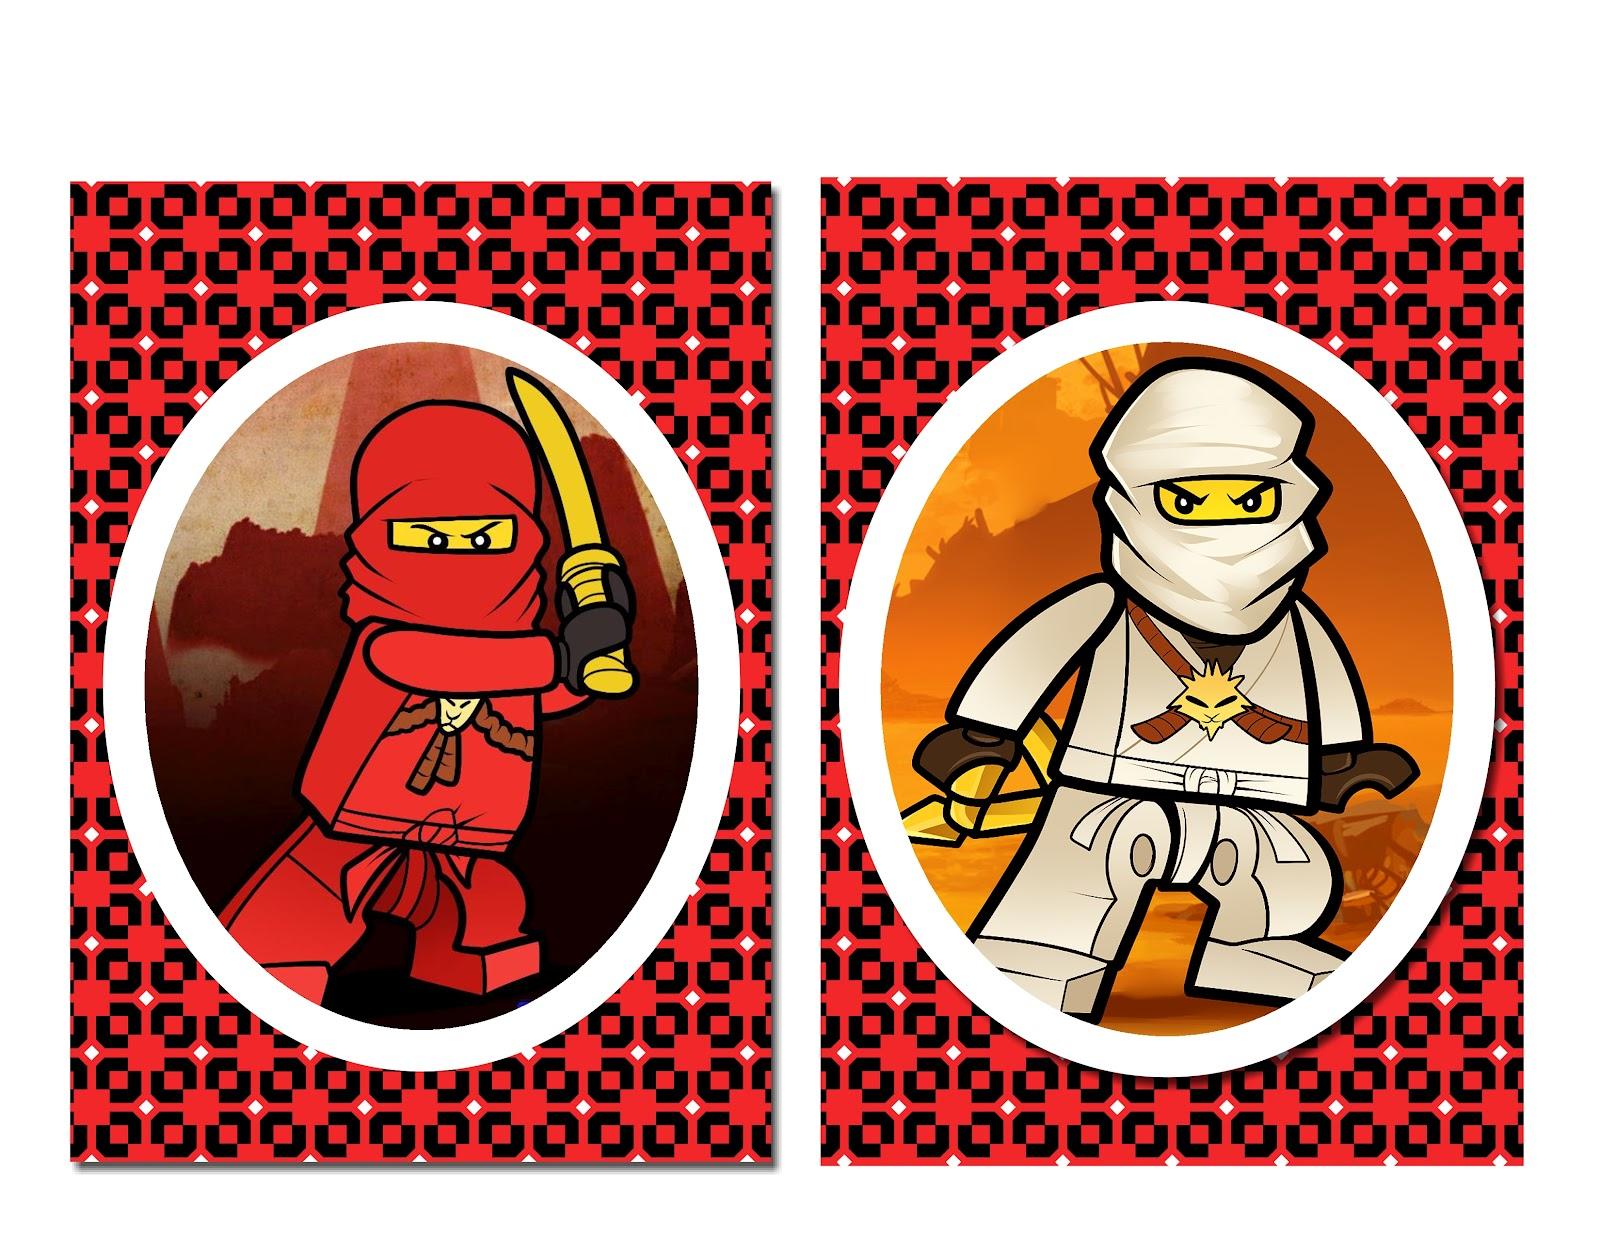 Just Random Thoughts: Lego Ninjago Party